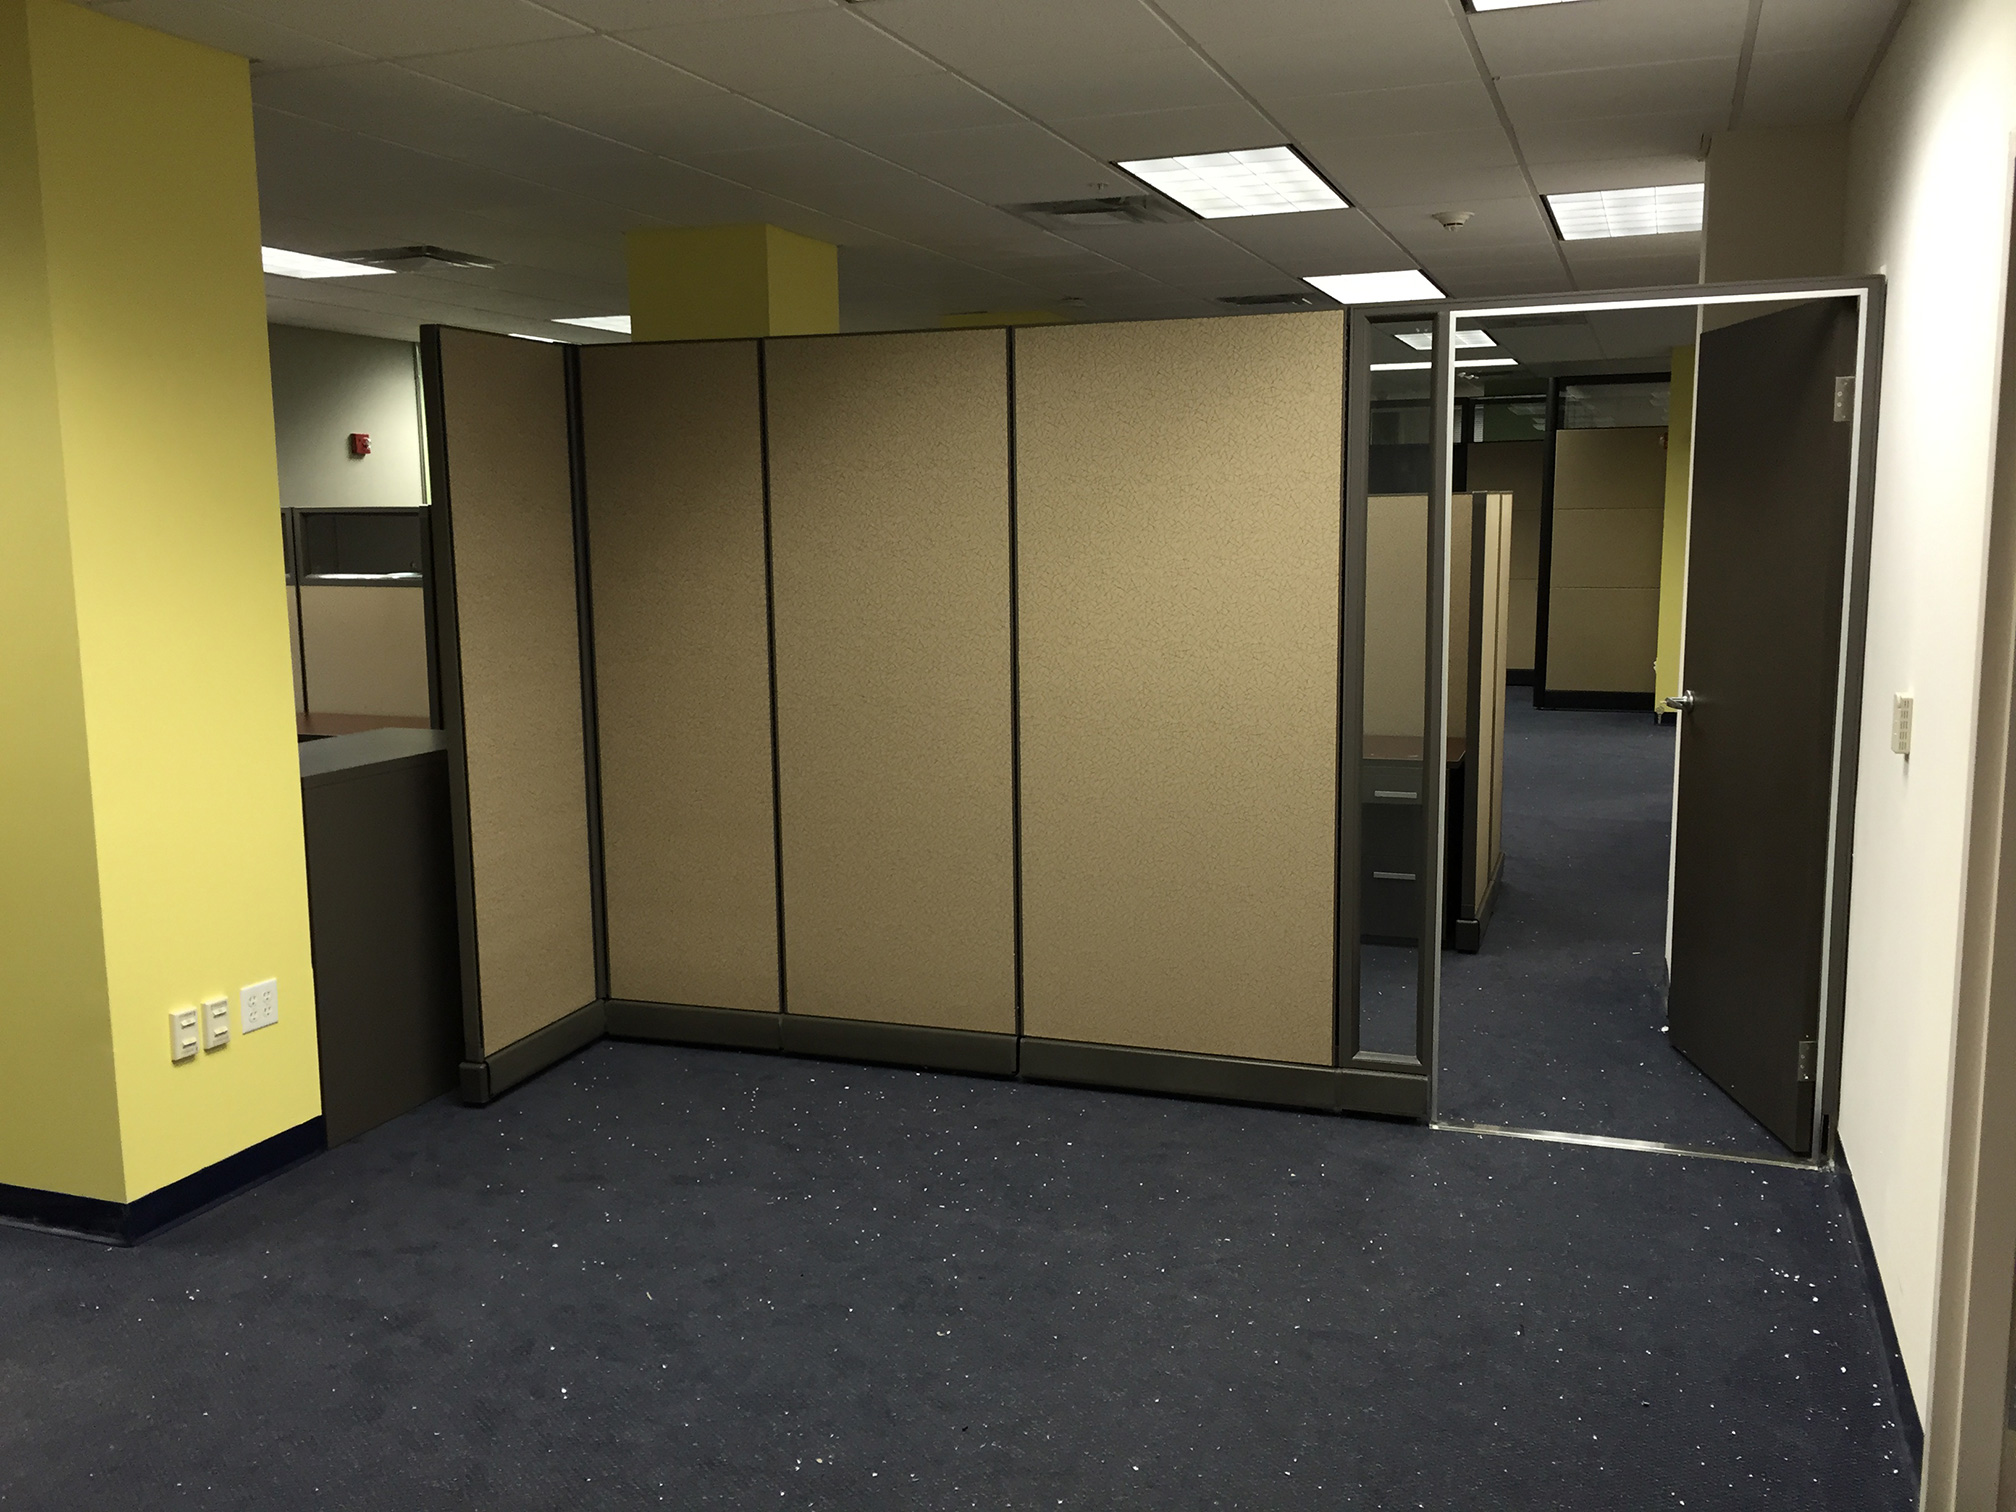 manasota-office-supplies-llc-img-6015-5-.jpg